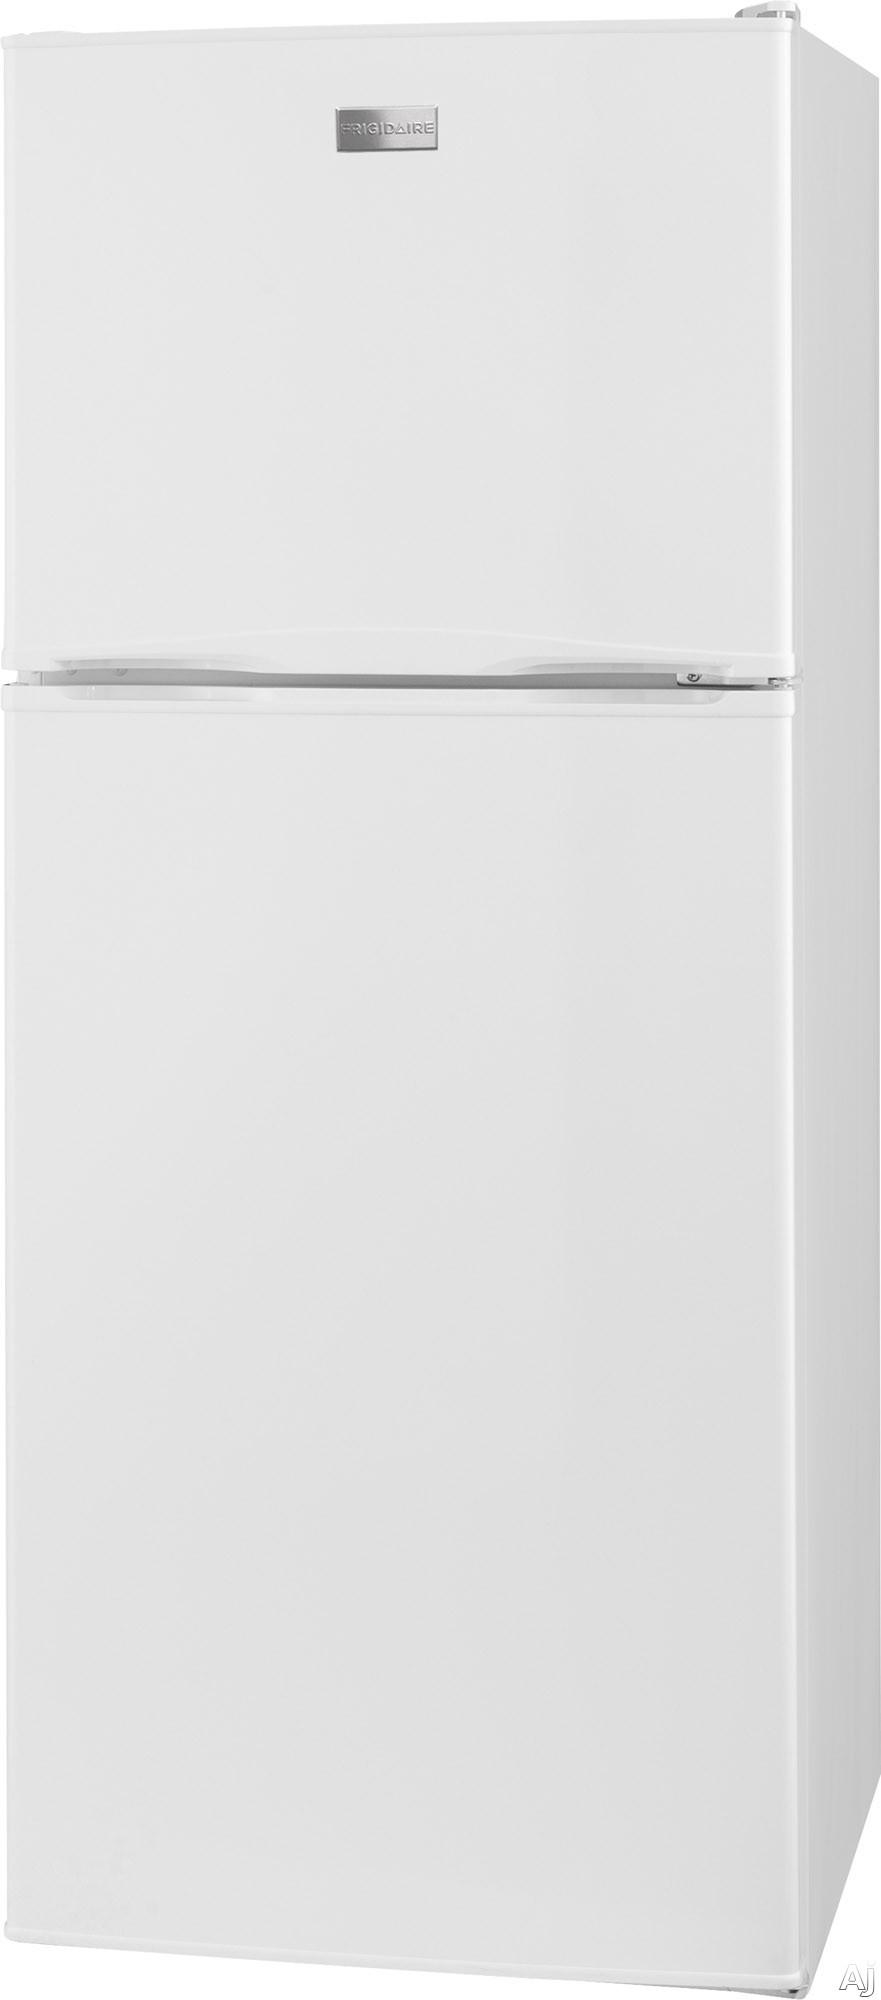 Frigidaire Fftr1022q 24 Inch Top Freezer Refrigerator With